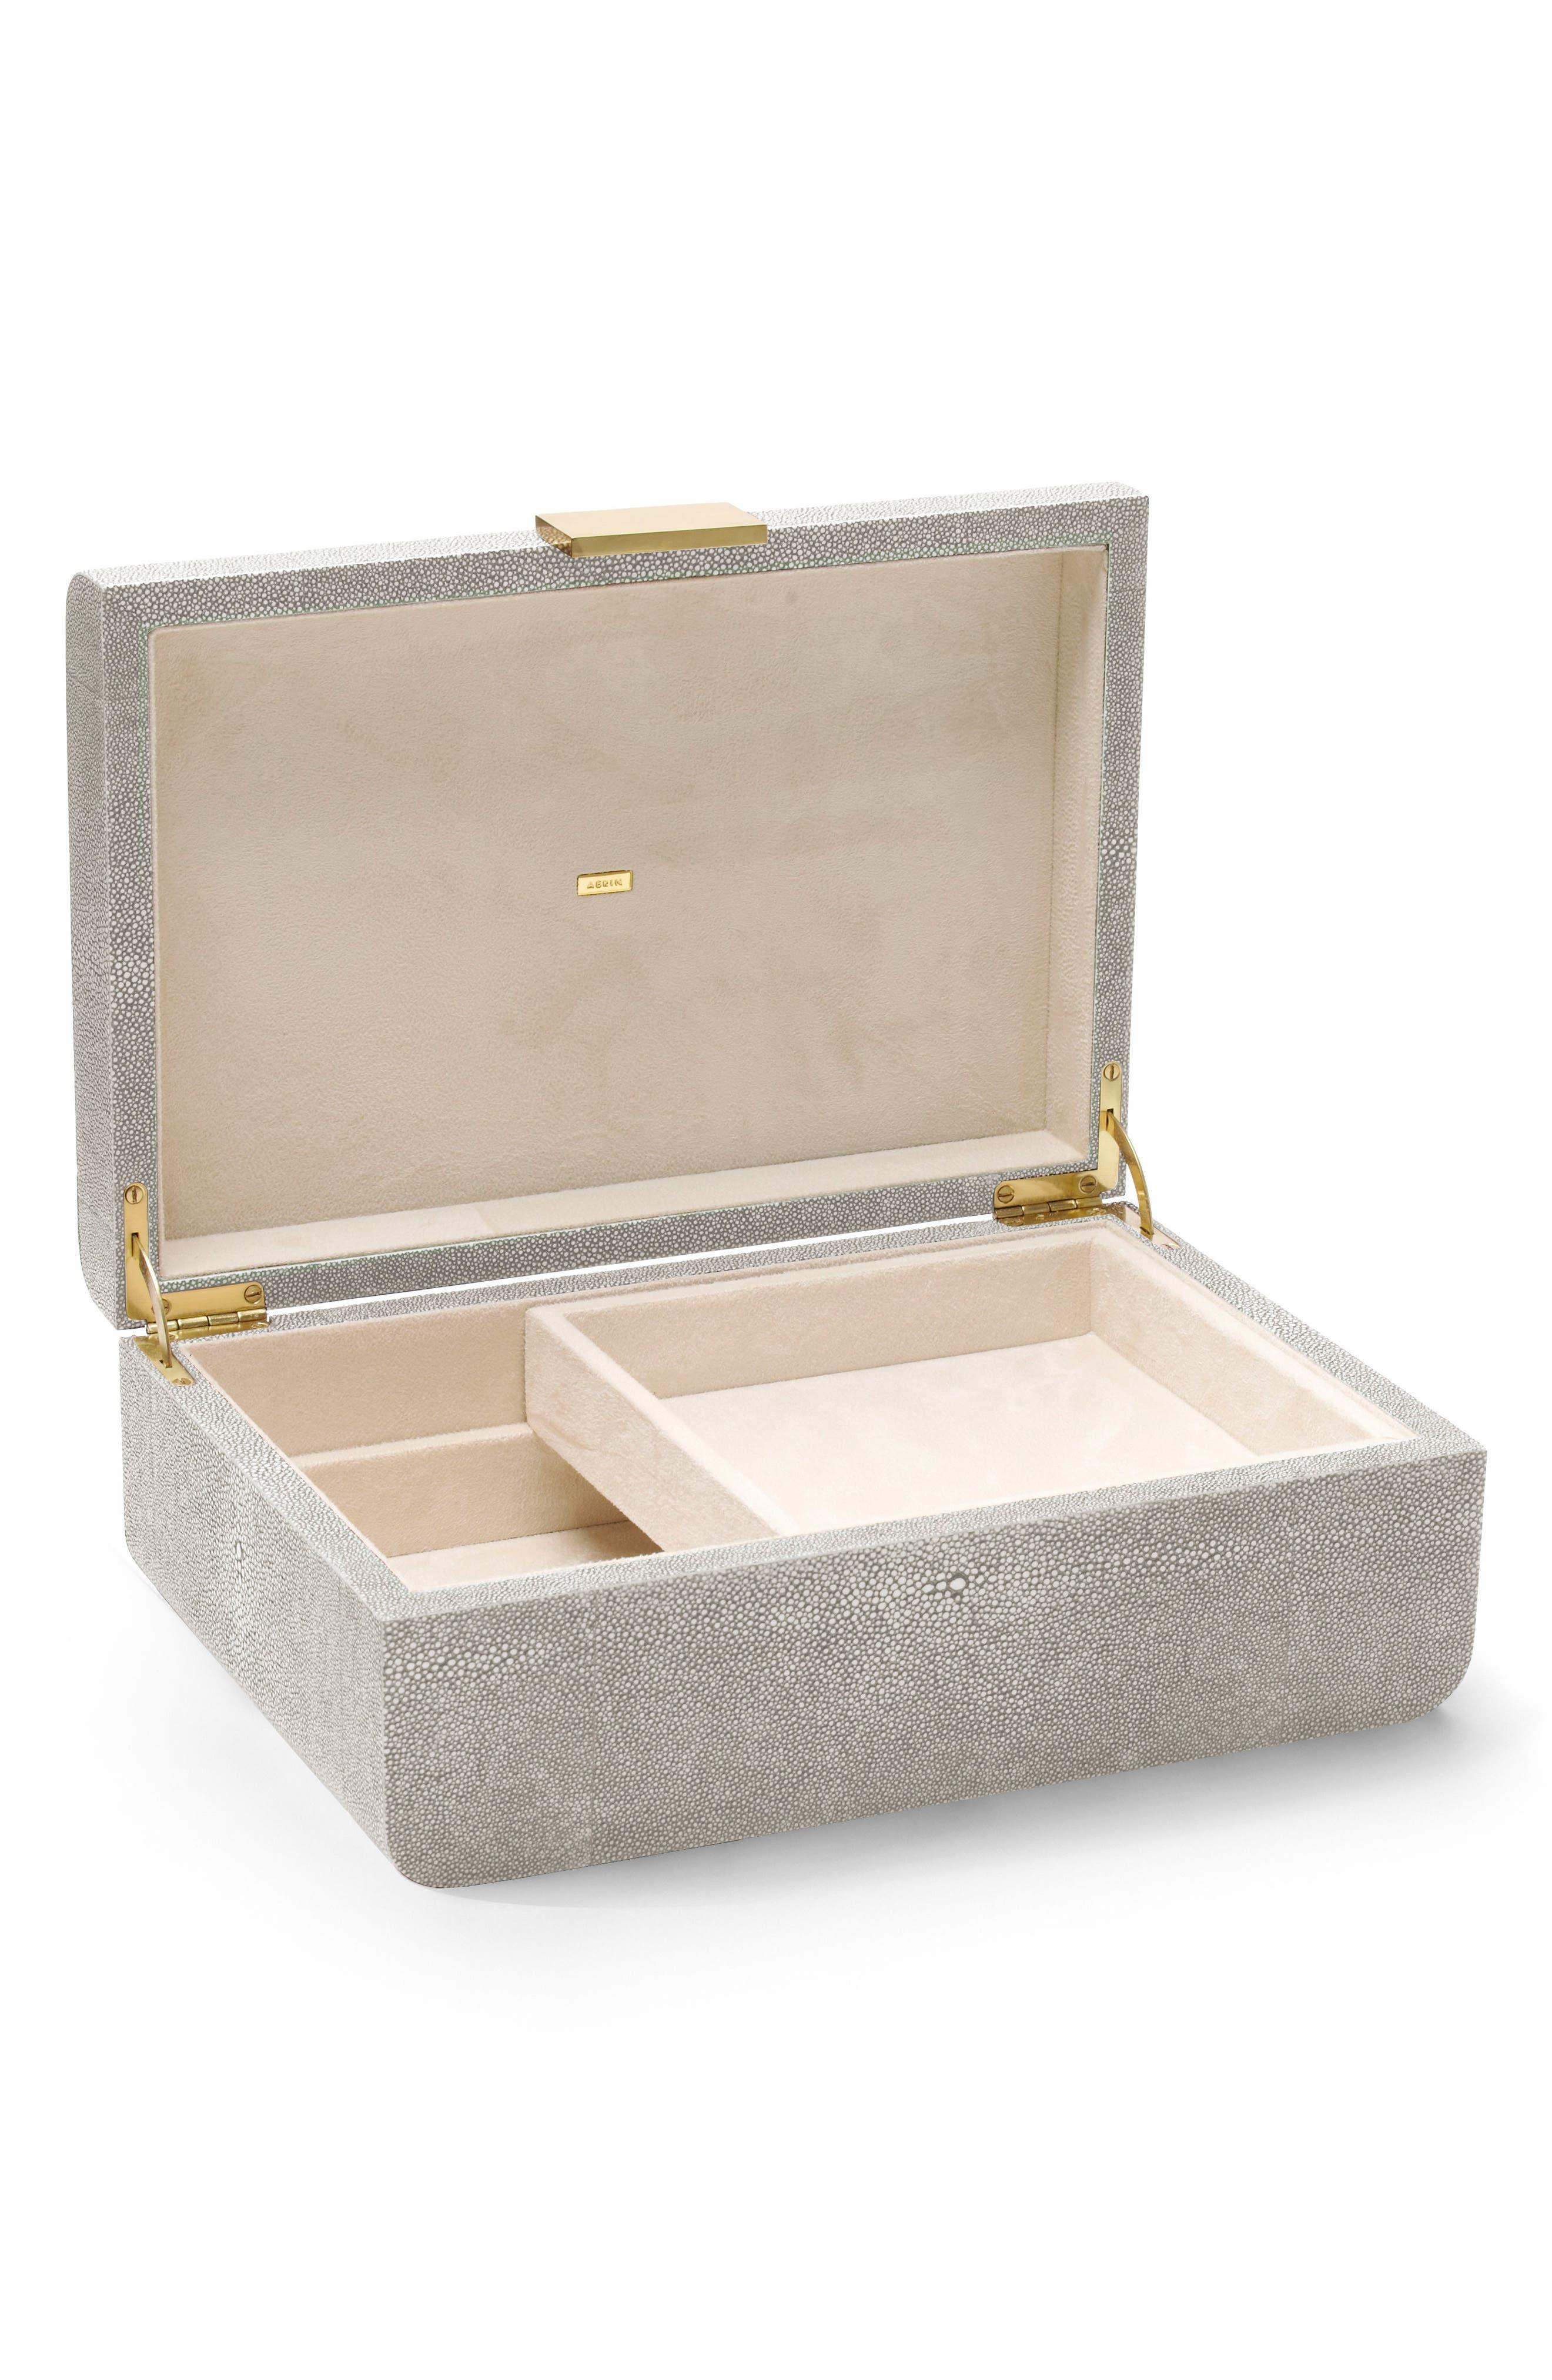 Modern Shagreen Jewelry Box,                             Alternate thumbnail 2, color,                             020